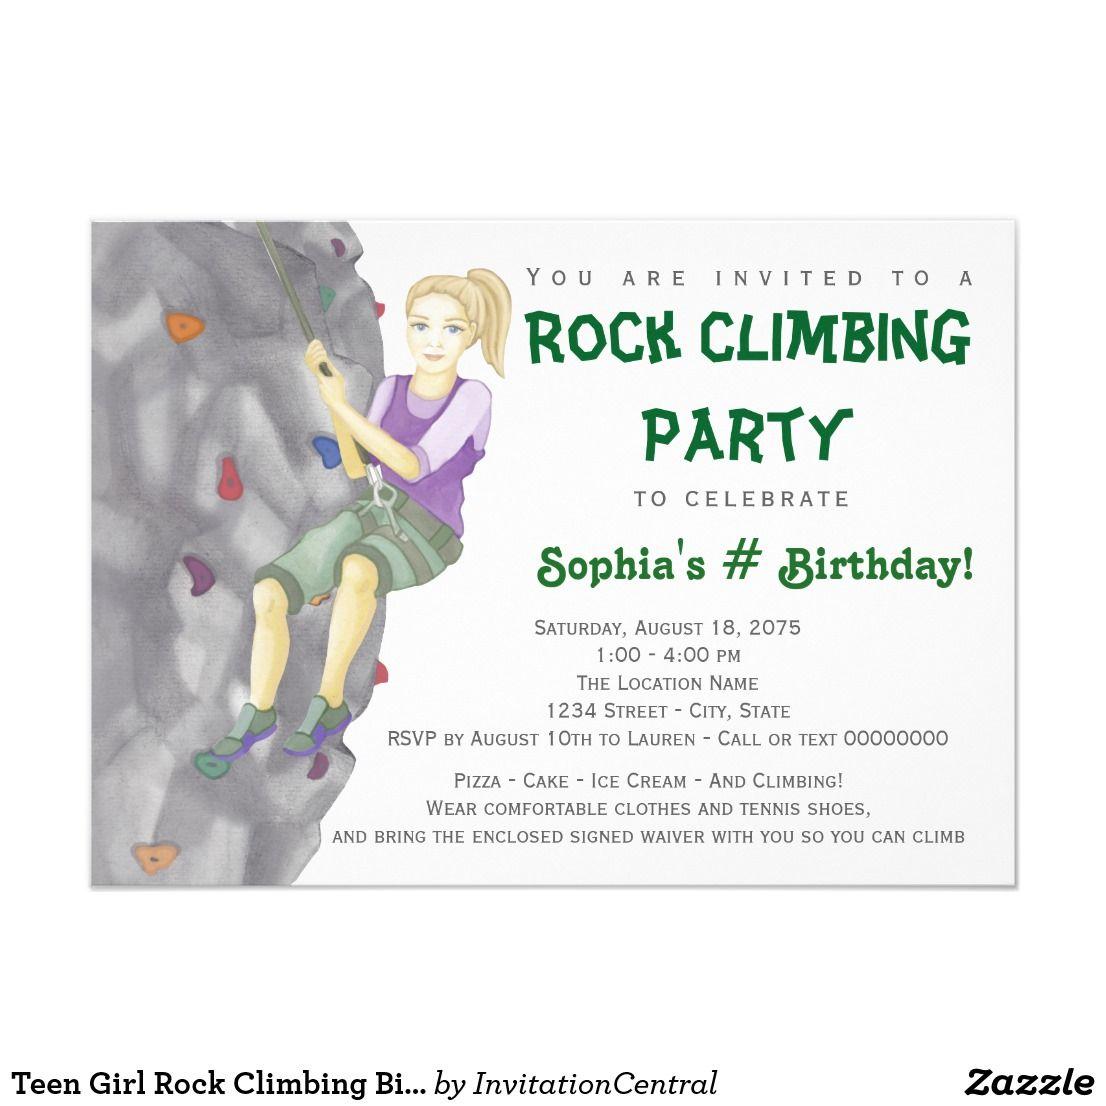 Teen Girl Rock Climbing Birthday Party Invitations | Pinterest ...